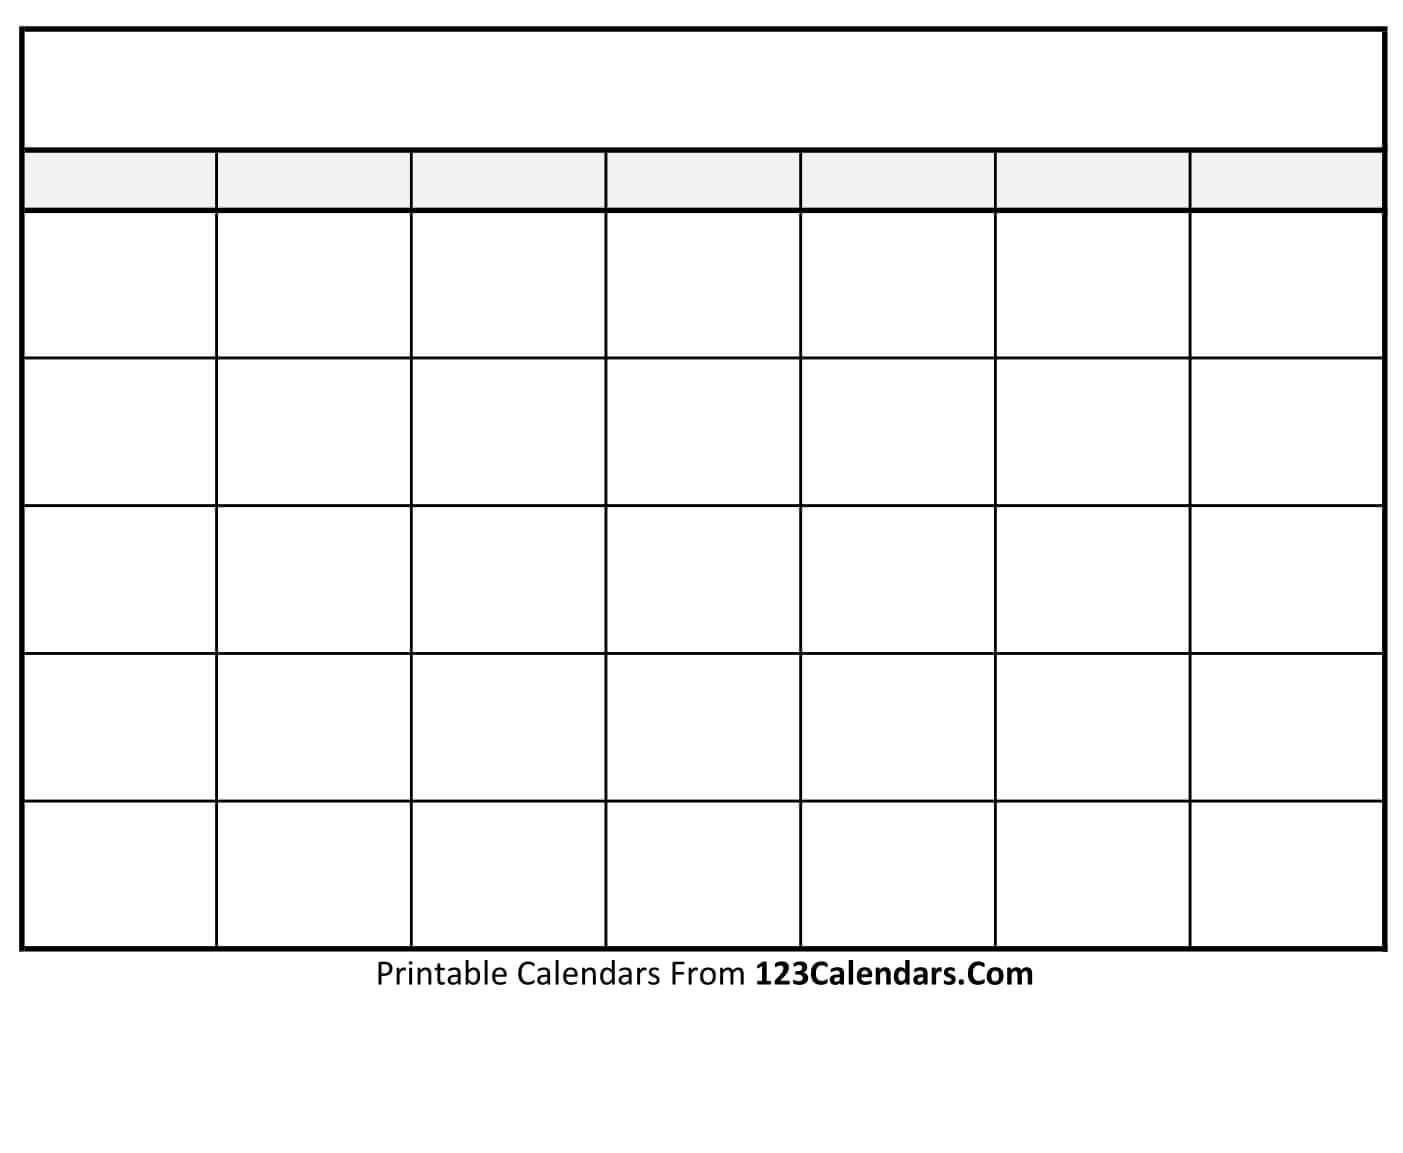 Free Printable Blank Calendar | 123Calendars-Blank Calendar Page Printable